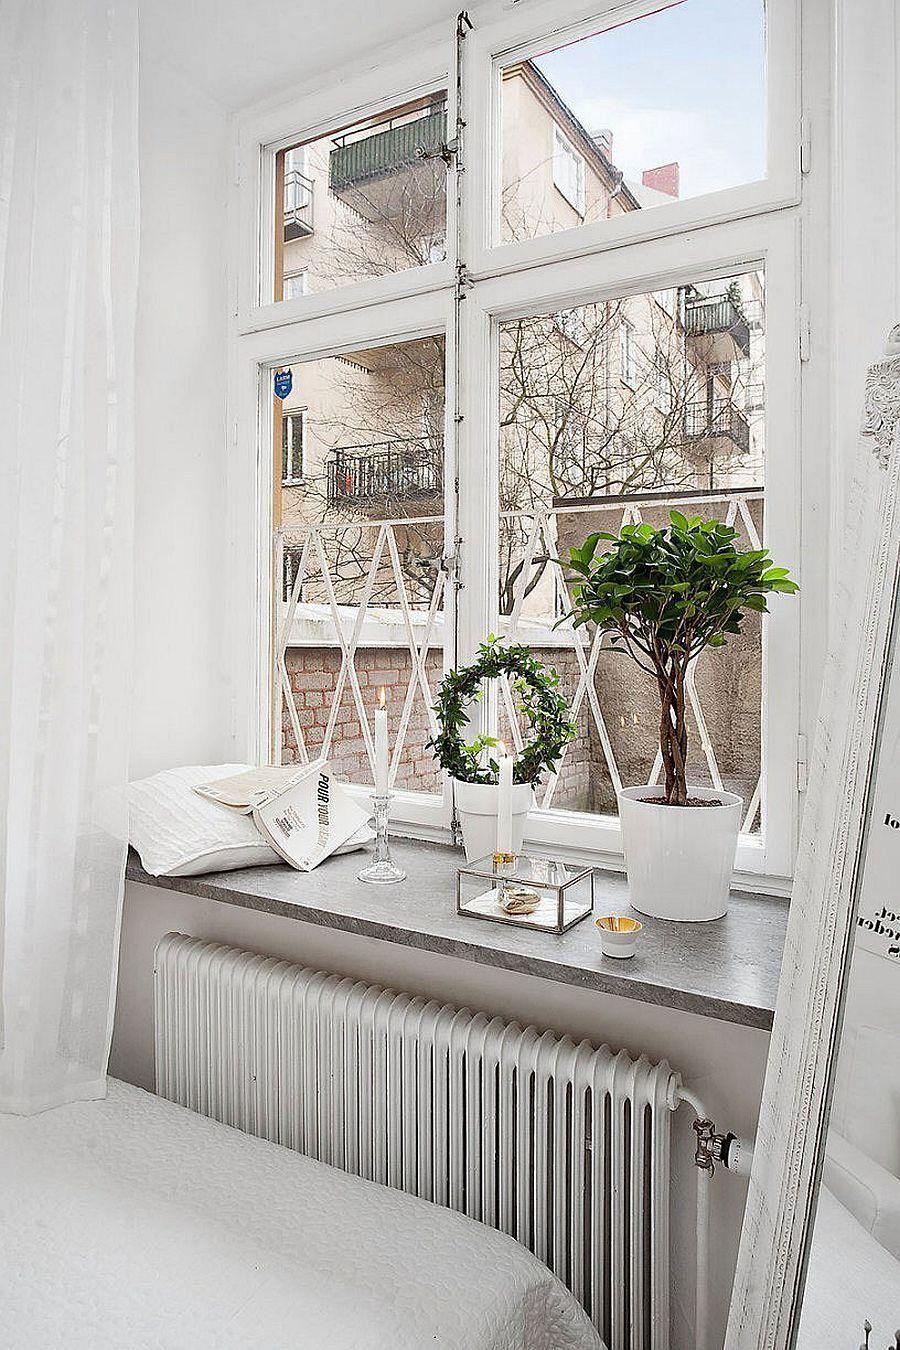 Interior Design For Window Sill Ideas Of Bathroom Pebble Mat All